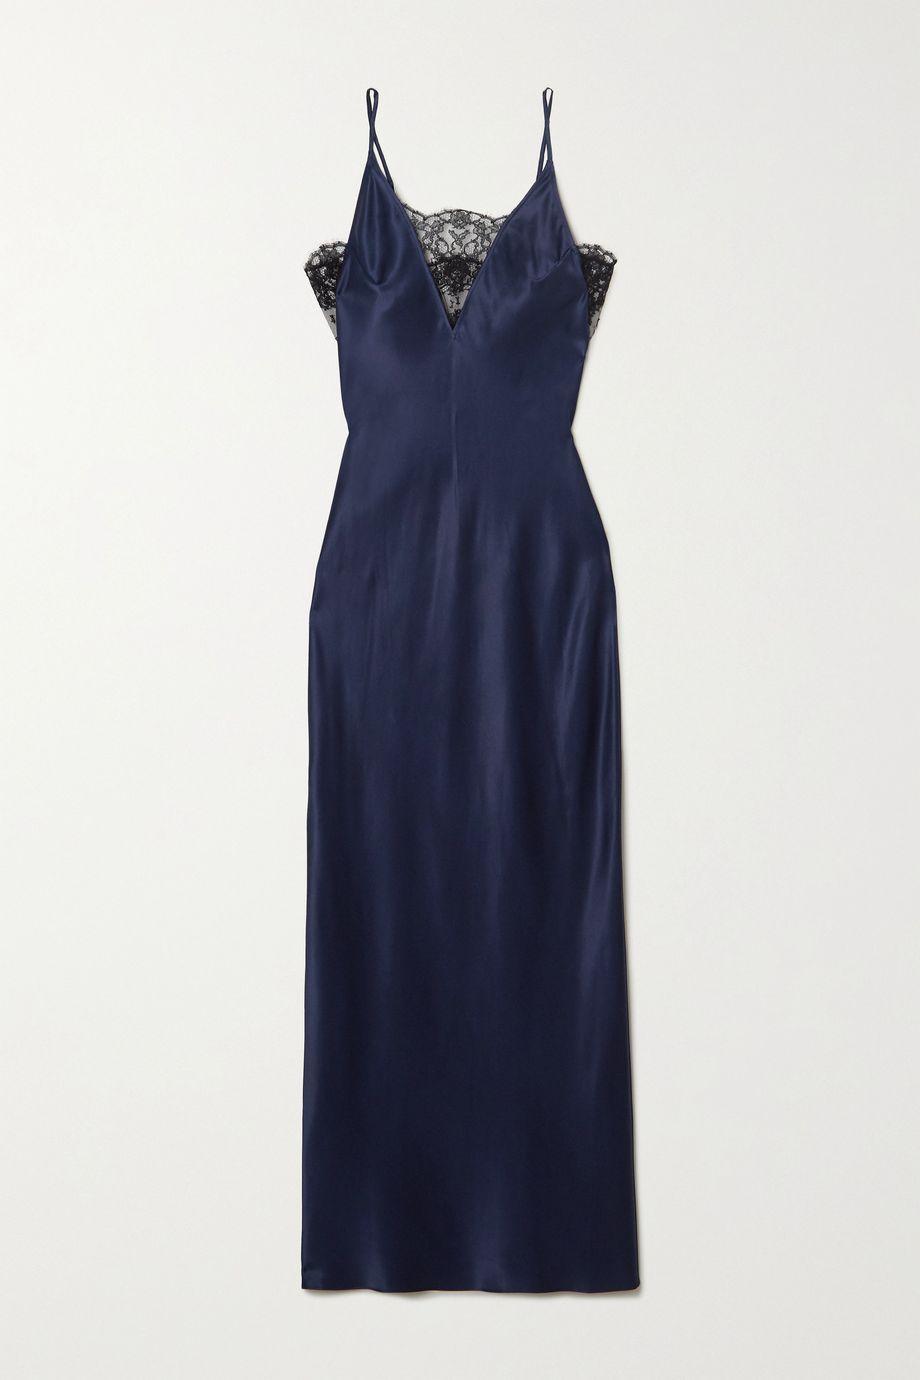 Fleur du Mal Daphne lace-trimmed silk-satin nightdress